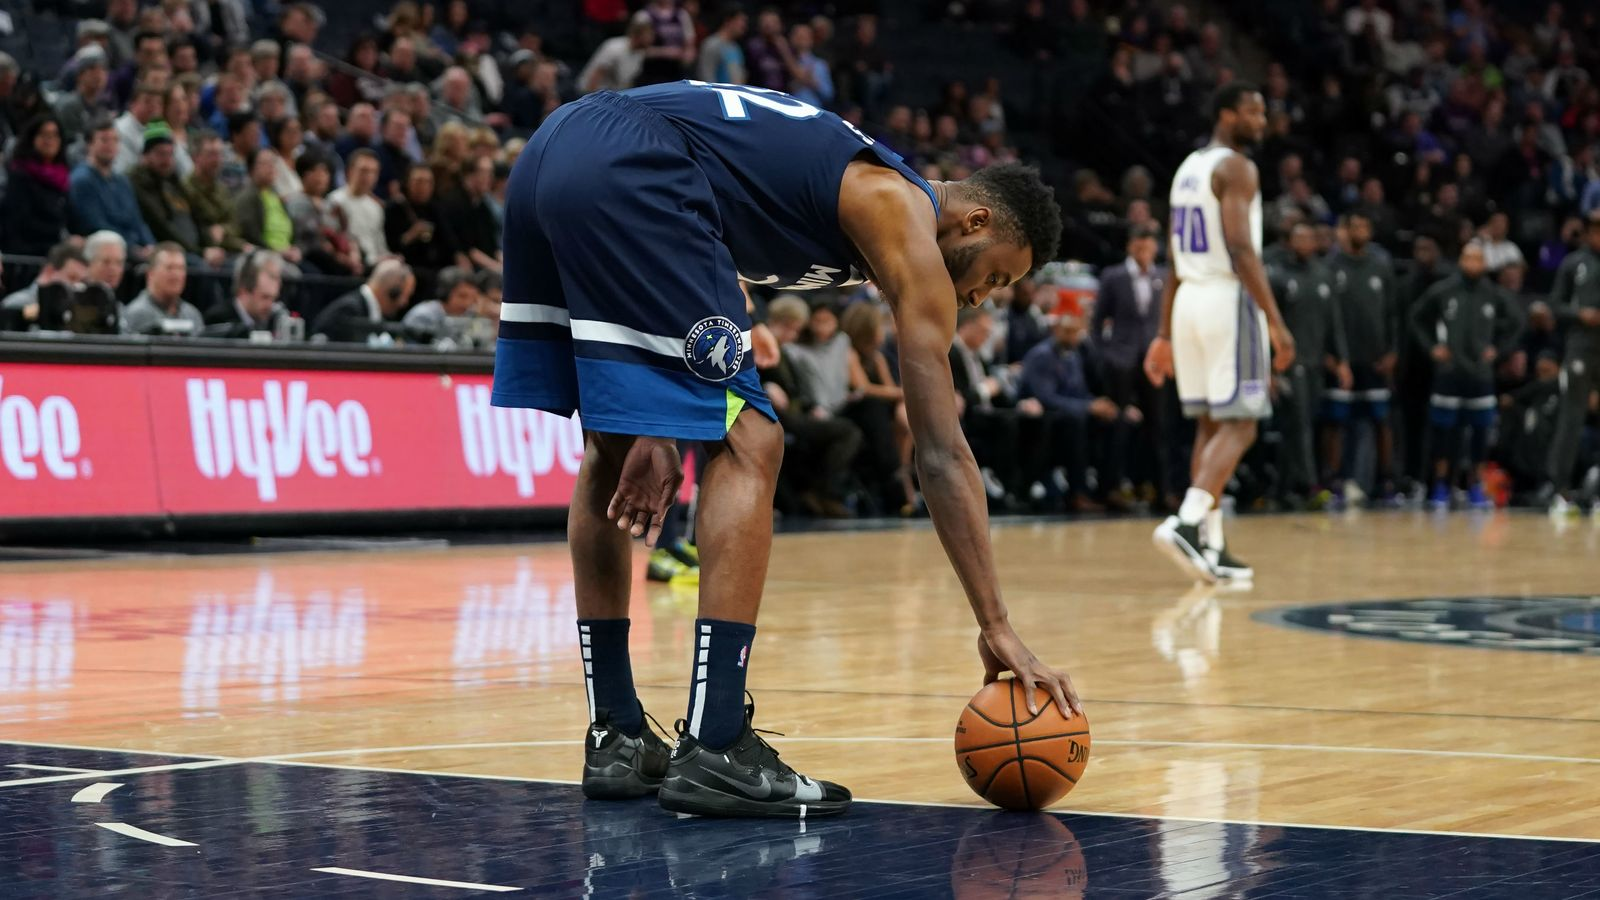 Timberwolves pay tribute to Kobe